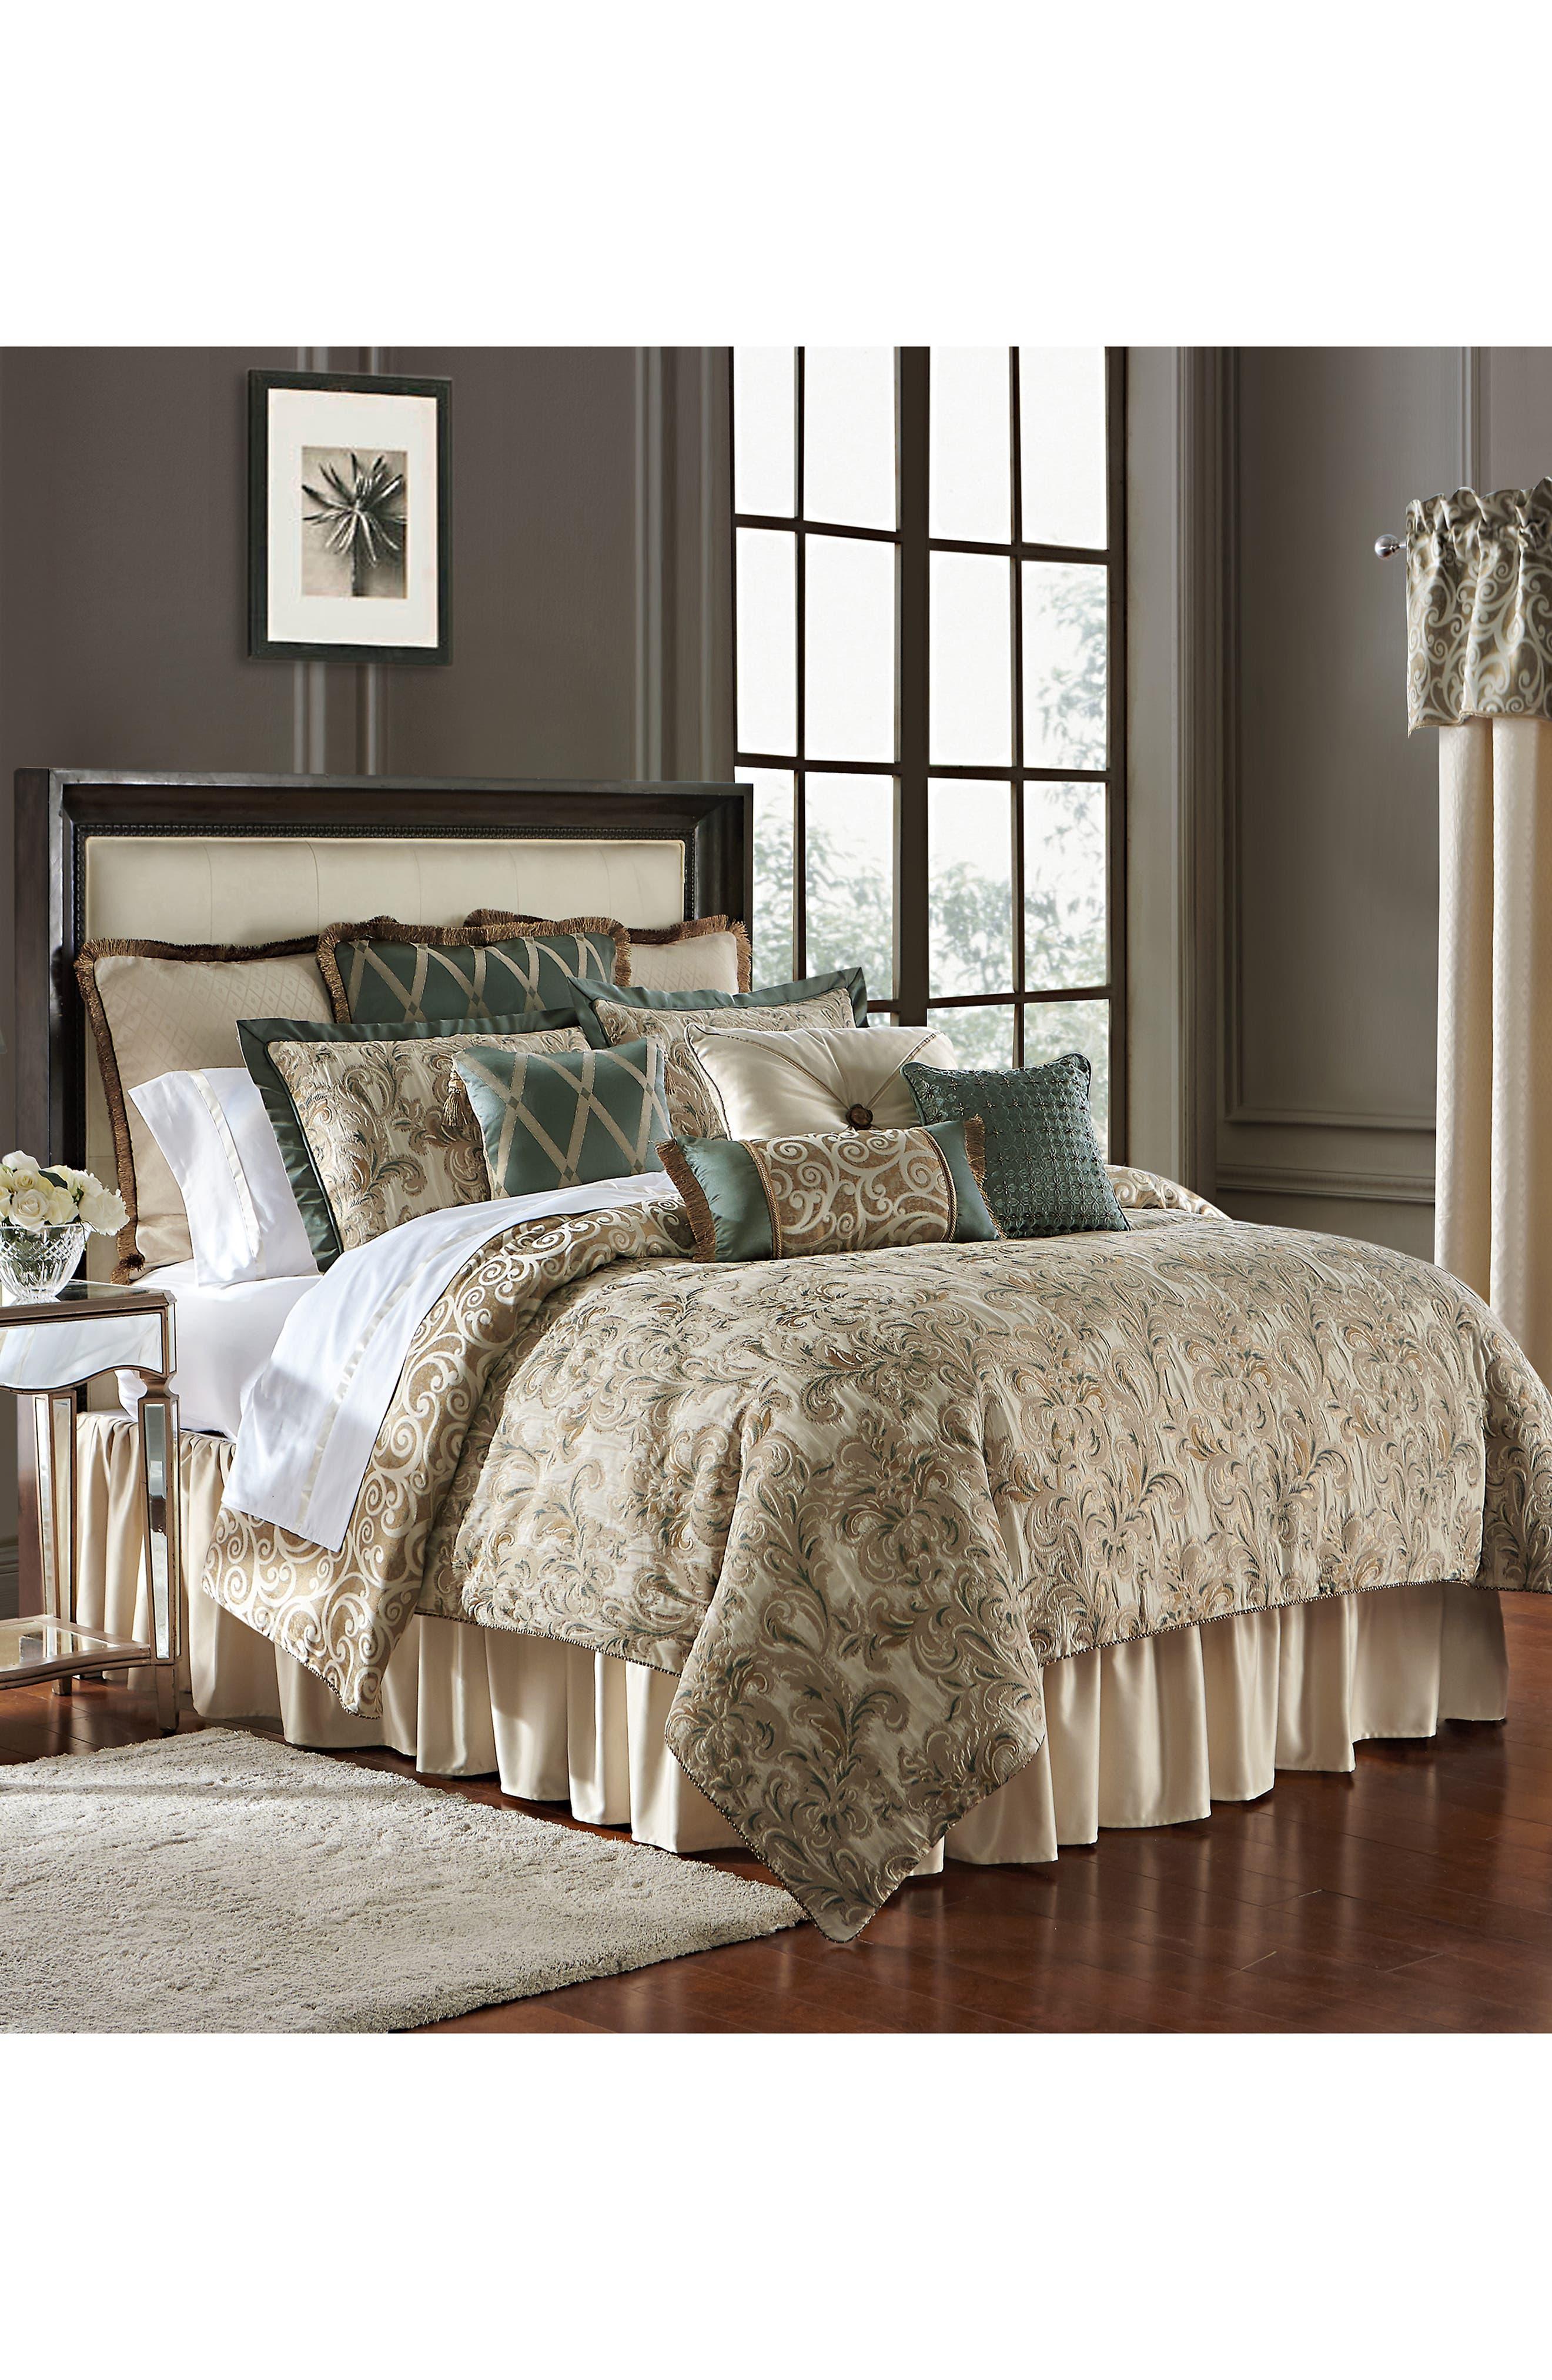 WATERFORD, Anora Comforter, Sham & Bed Skirt Set, Alternate thumbnail 3, color, BRASS/ JADE